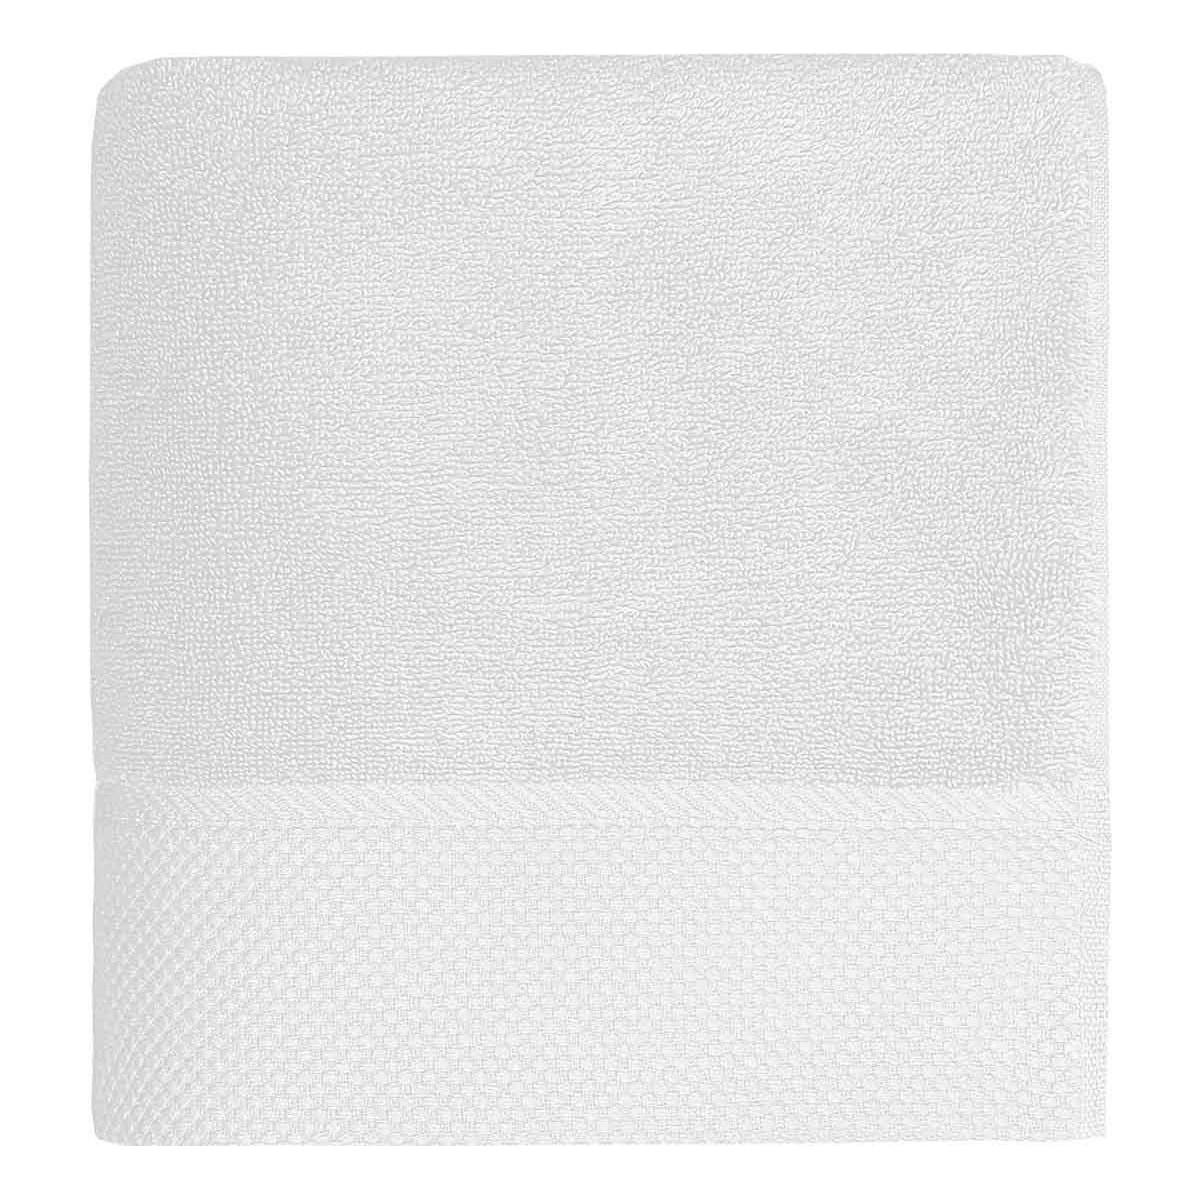 Drap de bain 560gr/m² Blanc 70x140 cm